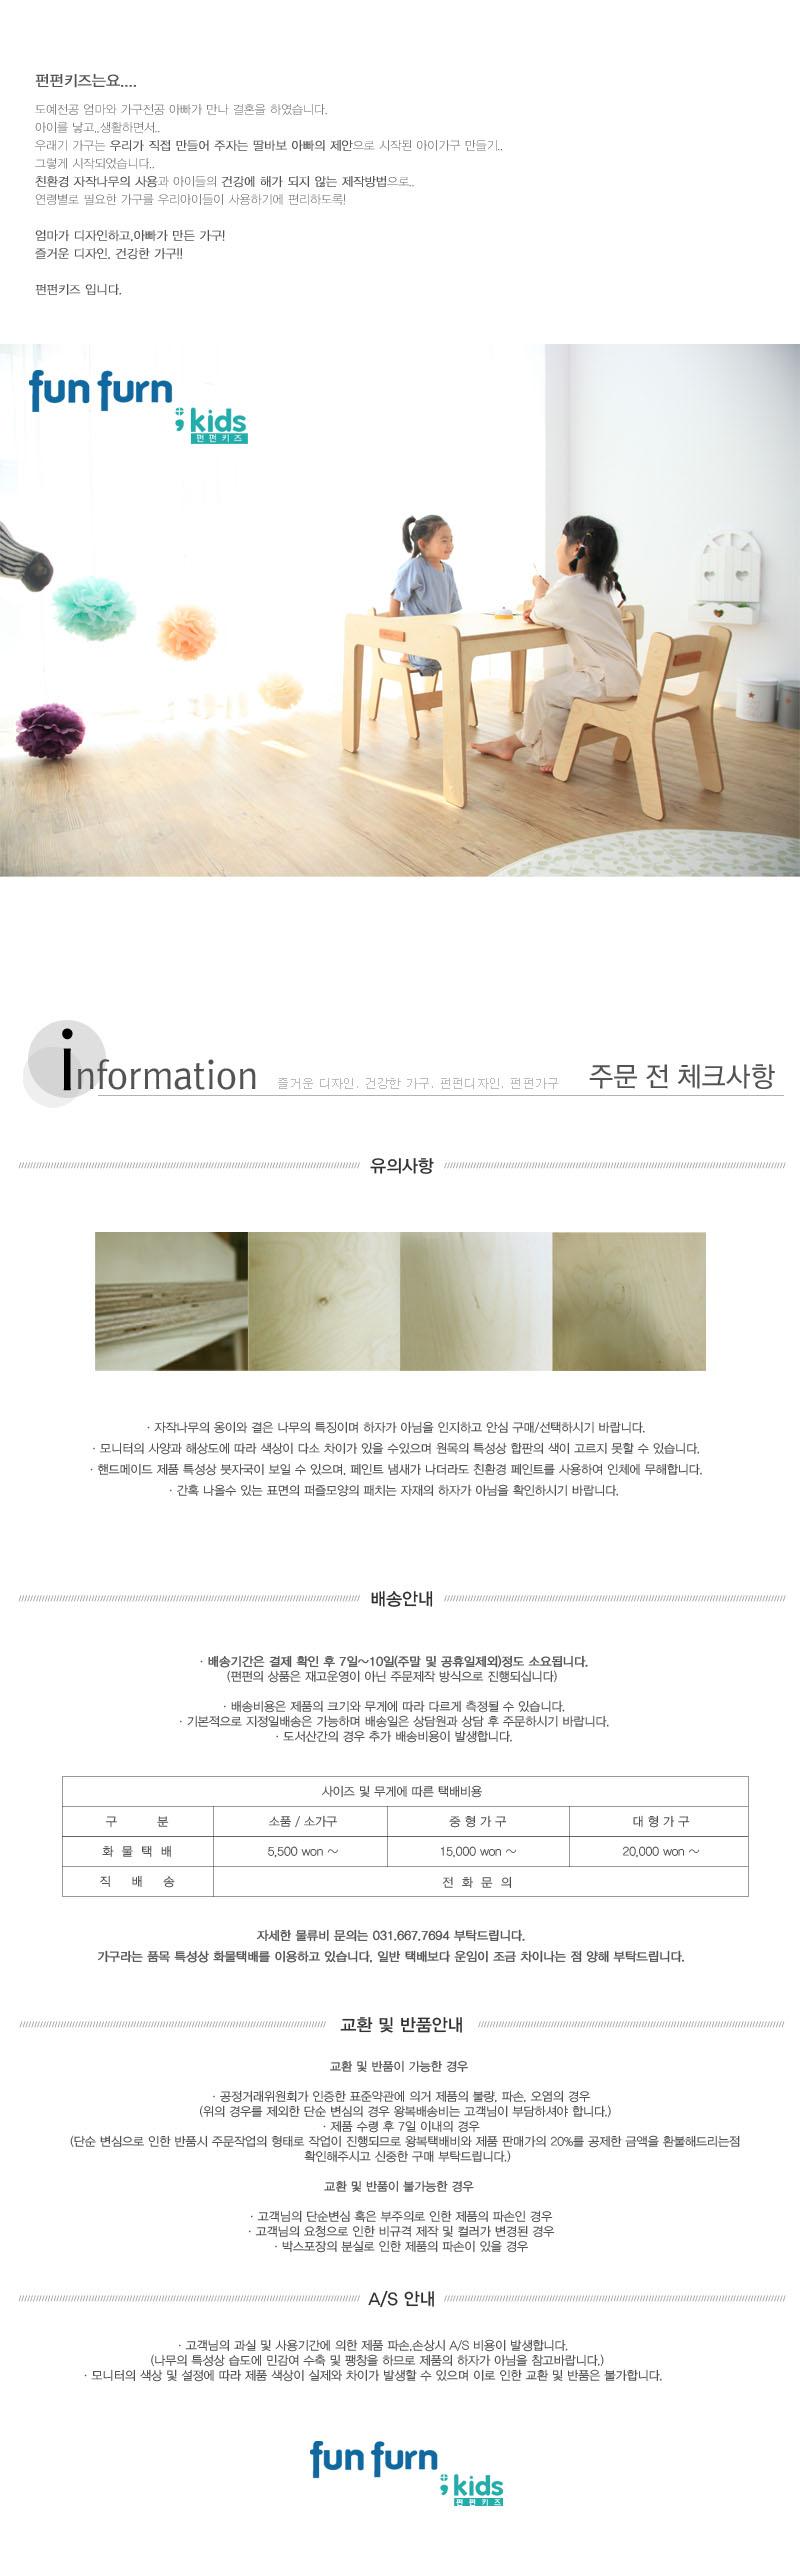 fj02-펀펀월드(우드세계지도 보드) - 펀펀, 108,000원, 장식/부자재, 벽장식